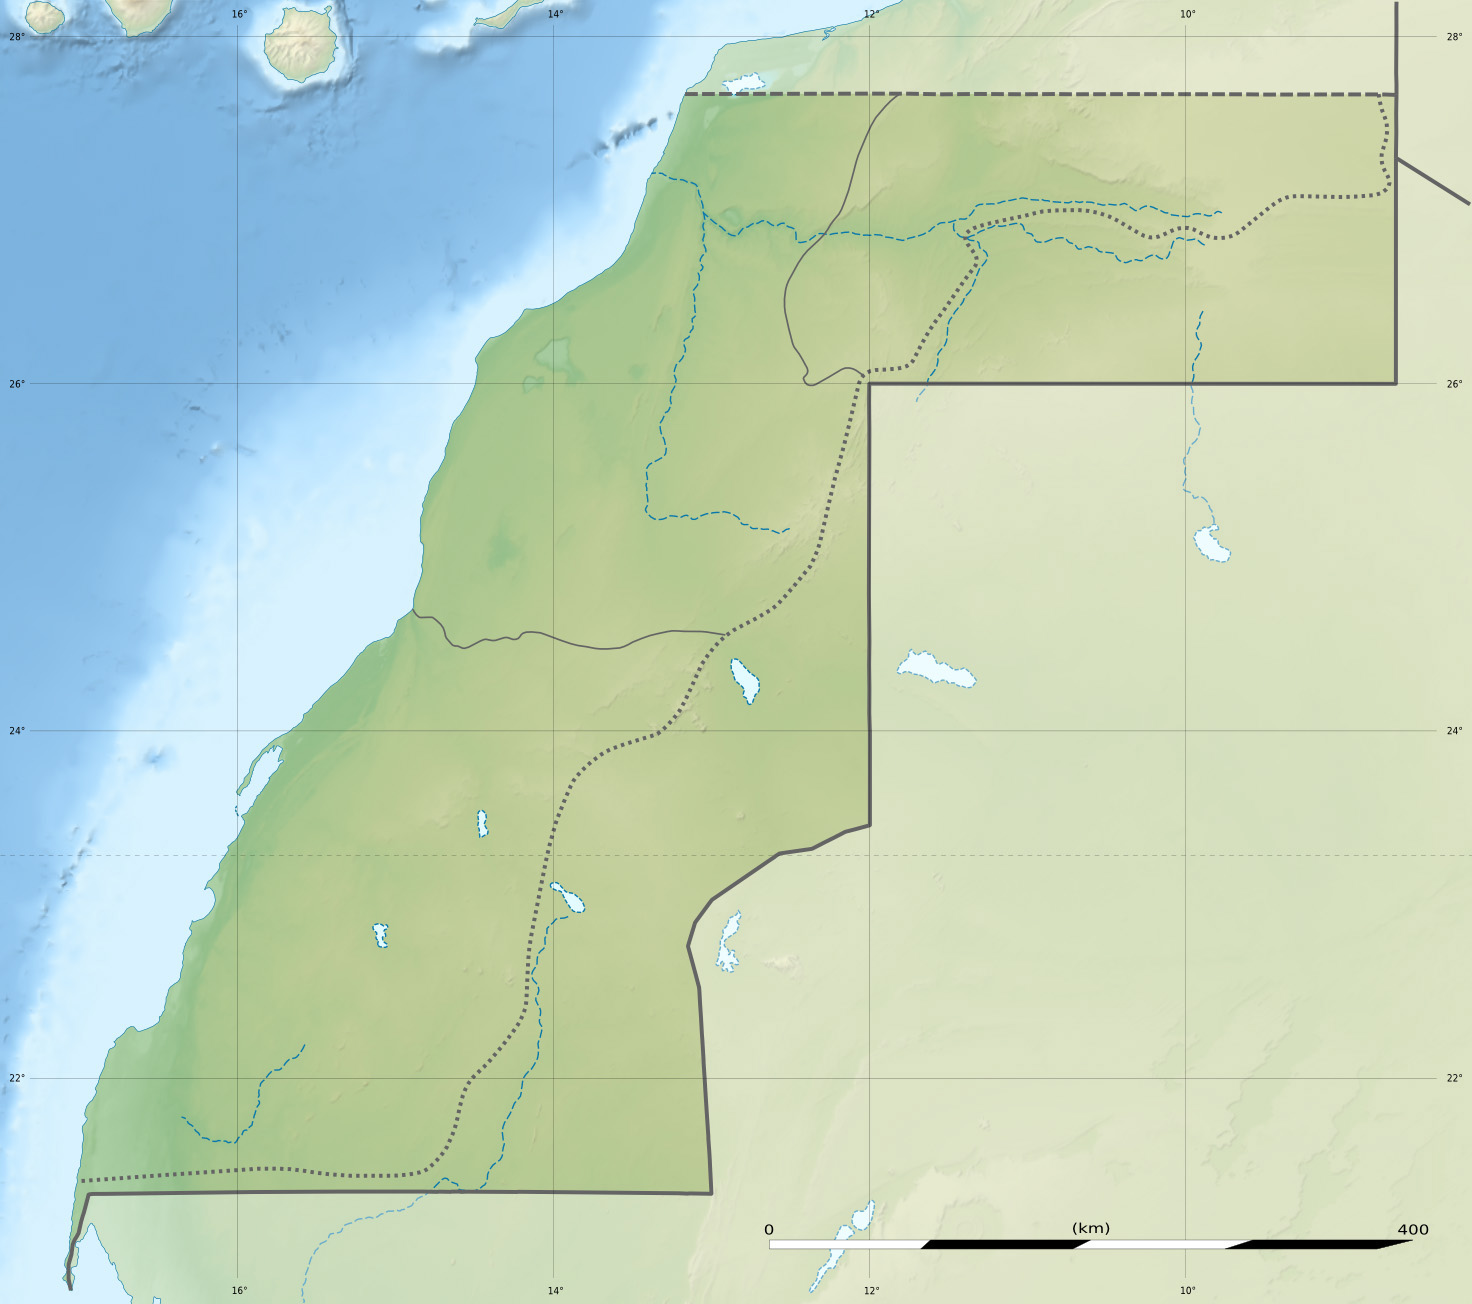 FileWestern Sahara relief location mapjpg Wikimedia Commons